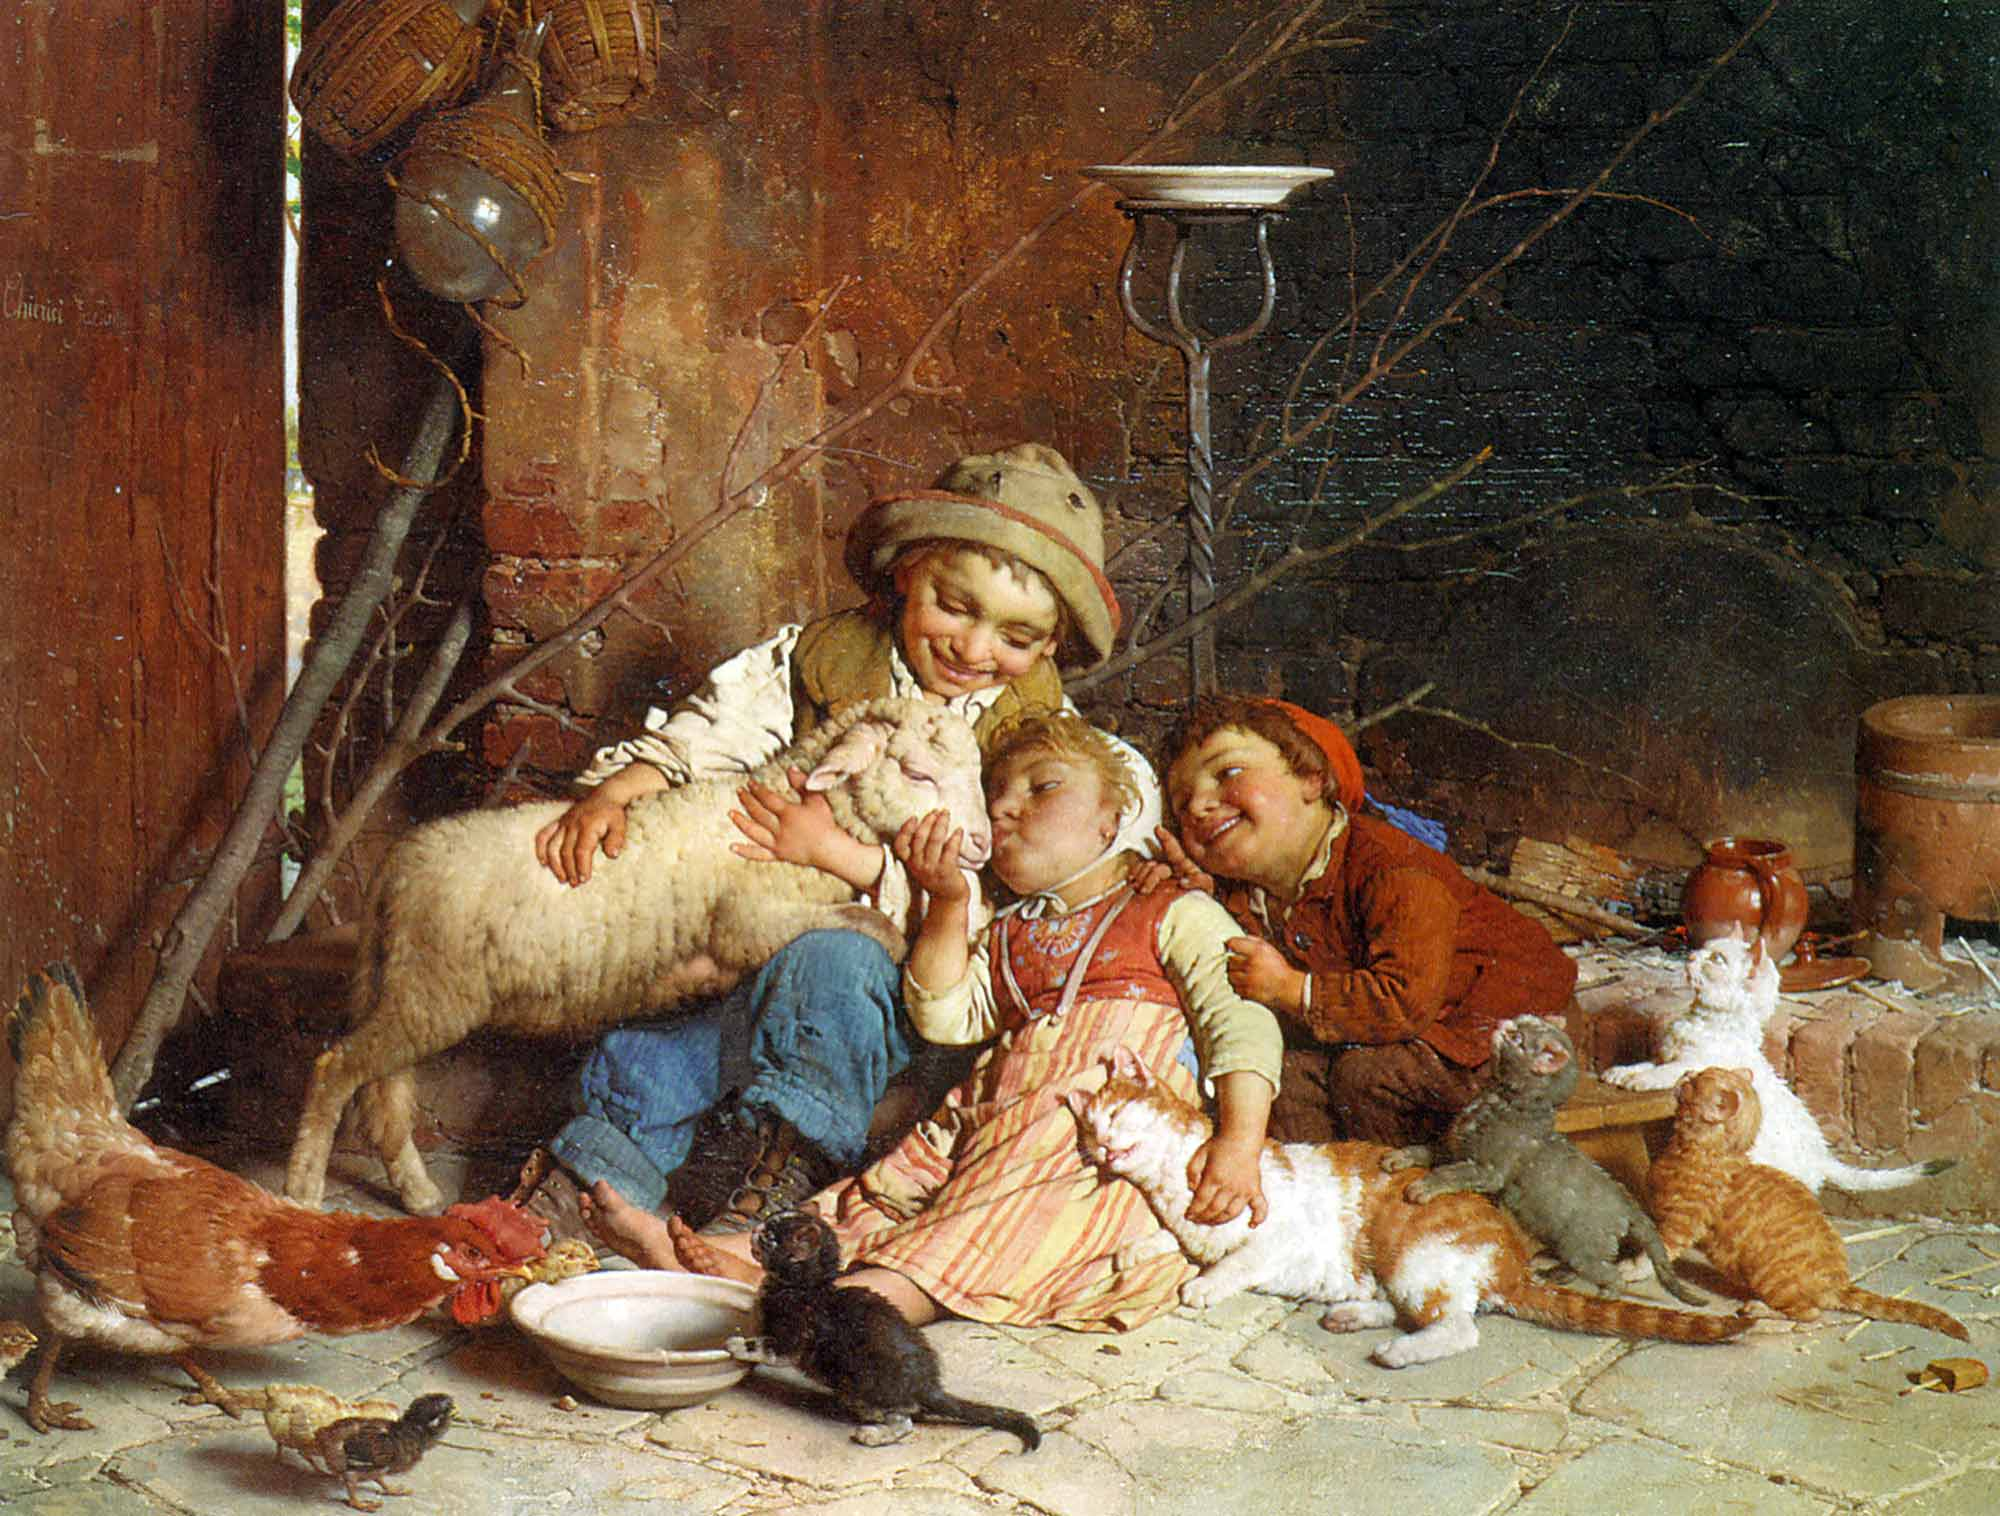 Gaetano Chierici Avludaki Afacanlar